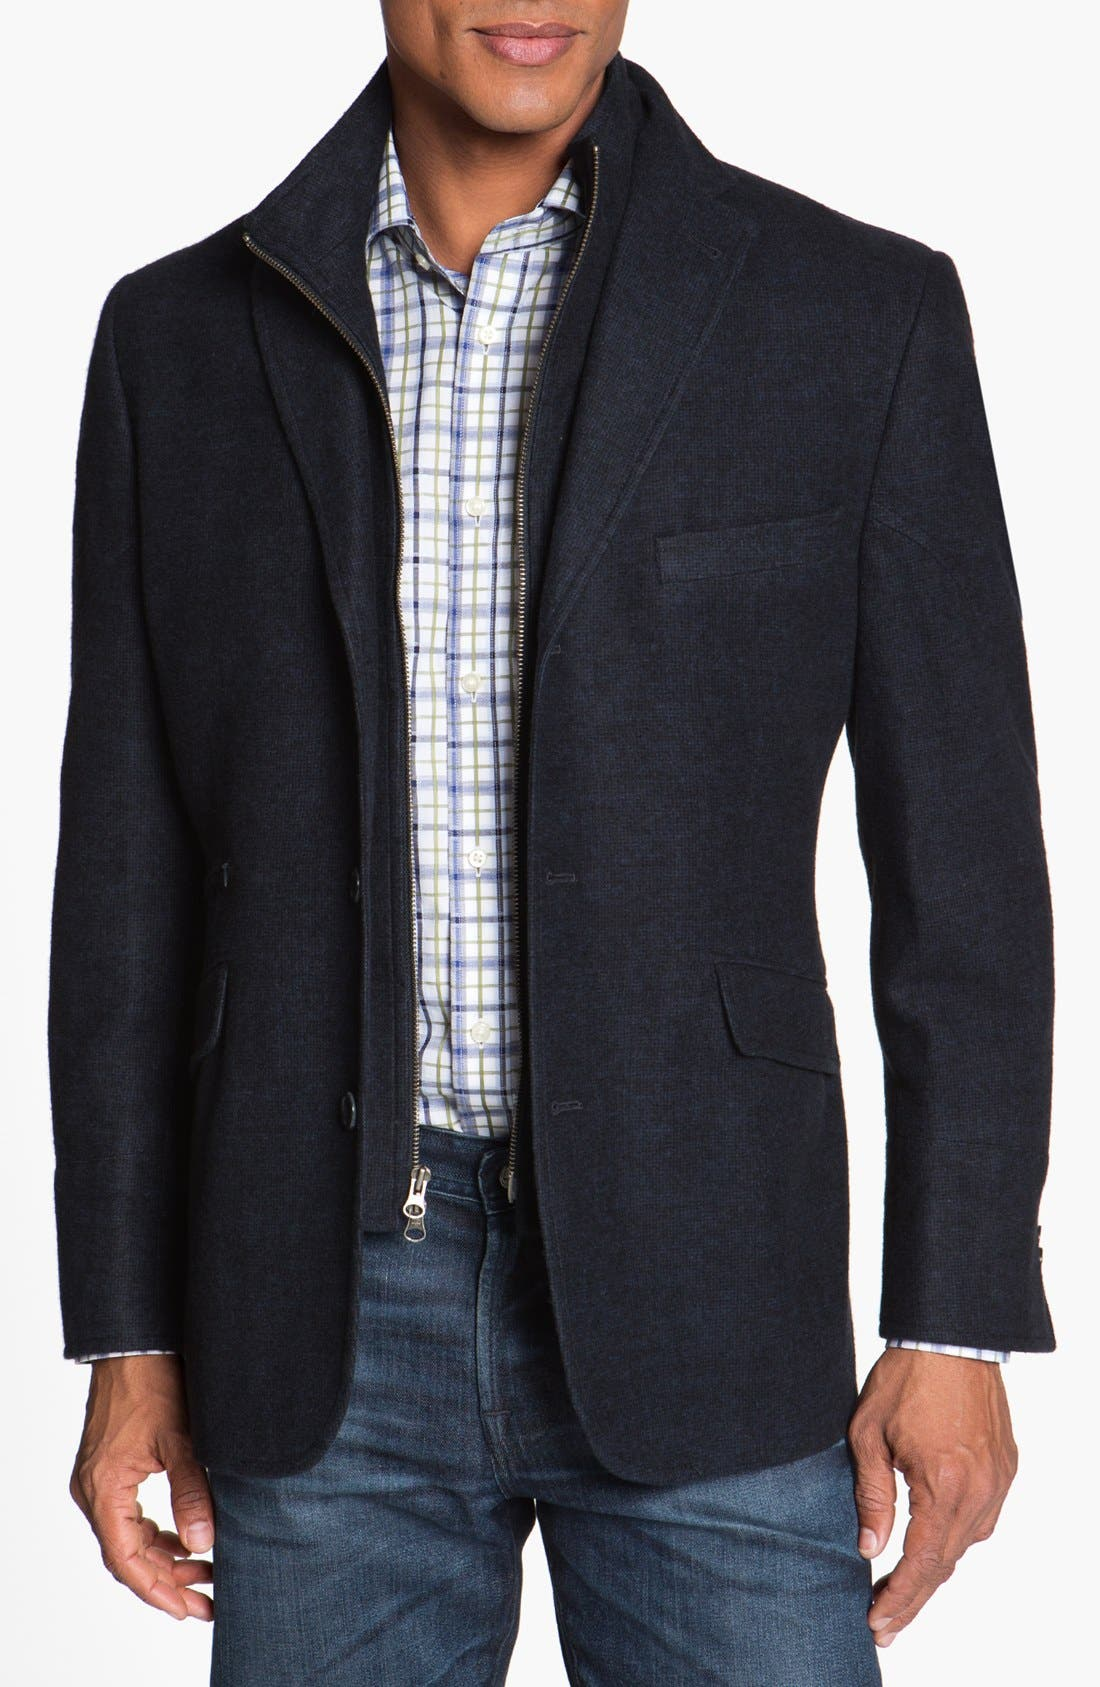 Main Image - Kroon 'Ritchie' Sportcoat